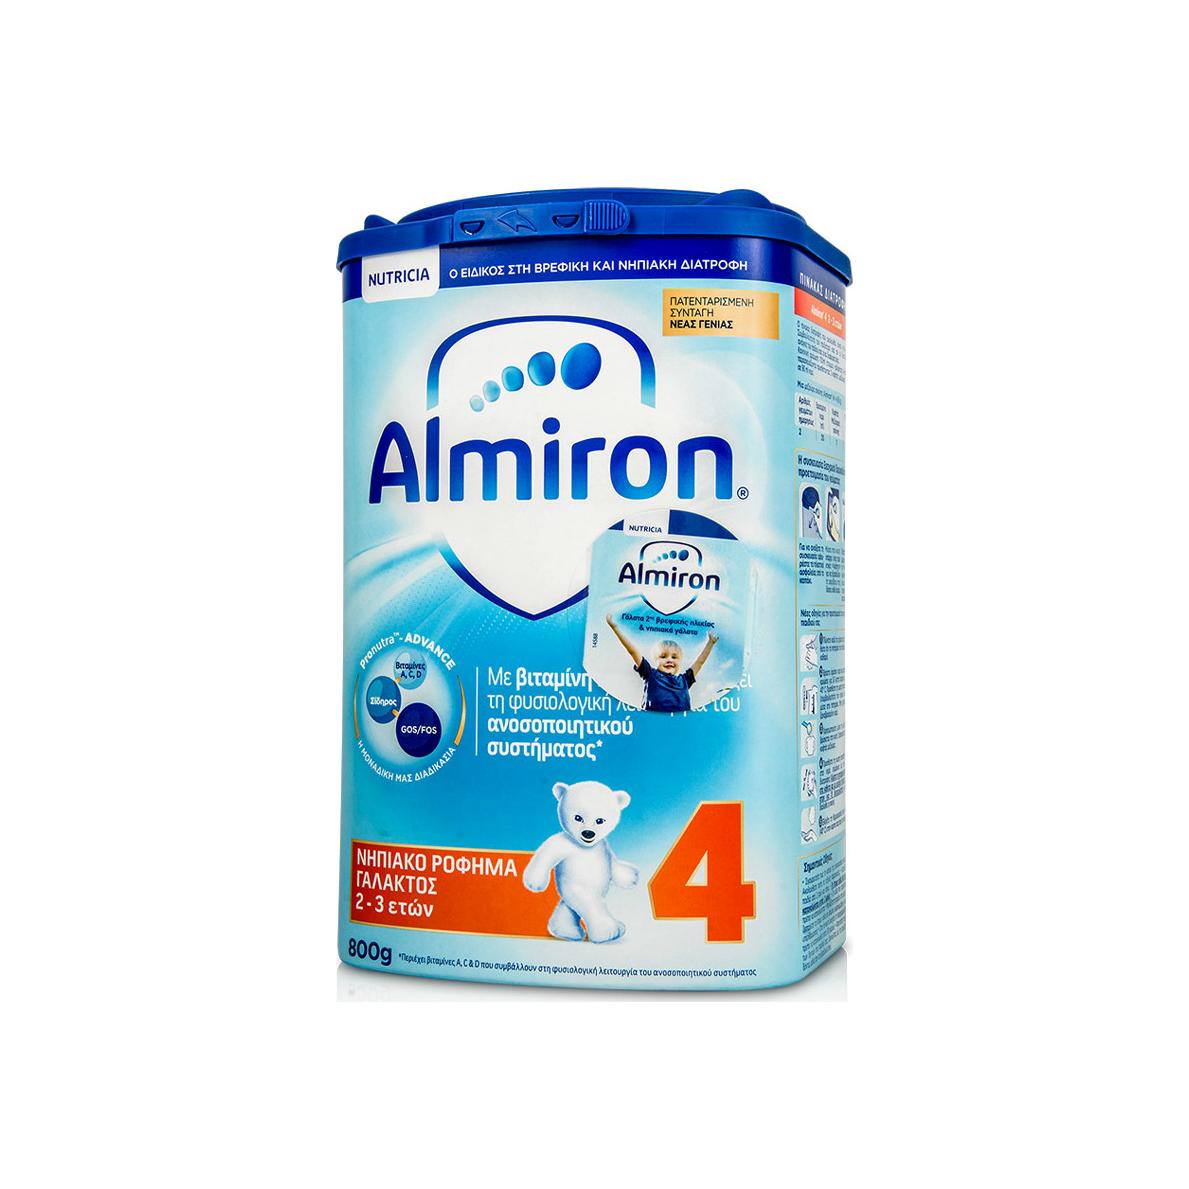 Nutricia Almiron 4 Νηπιακό Ρόφημα Γάλακτος 2-3 Ετών 800gr